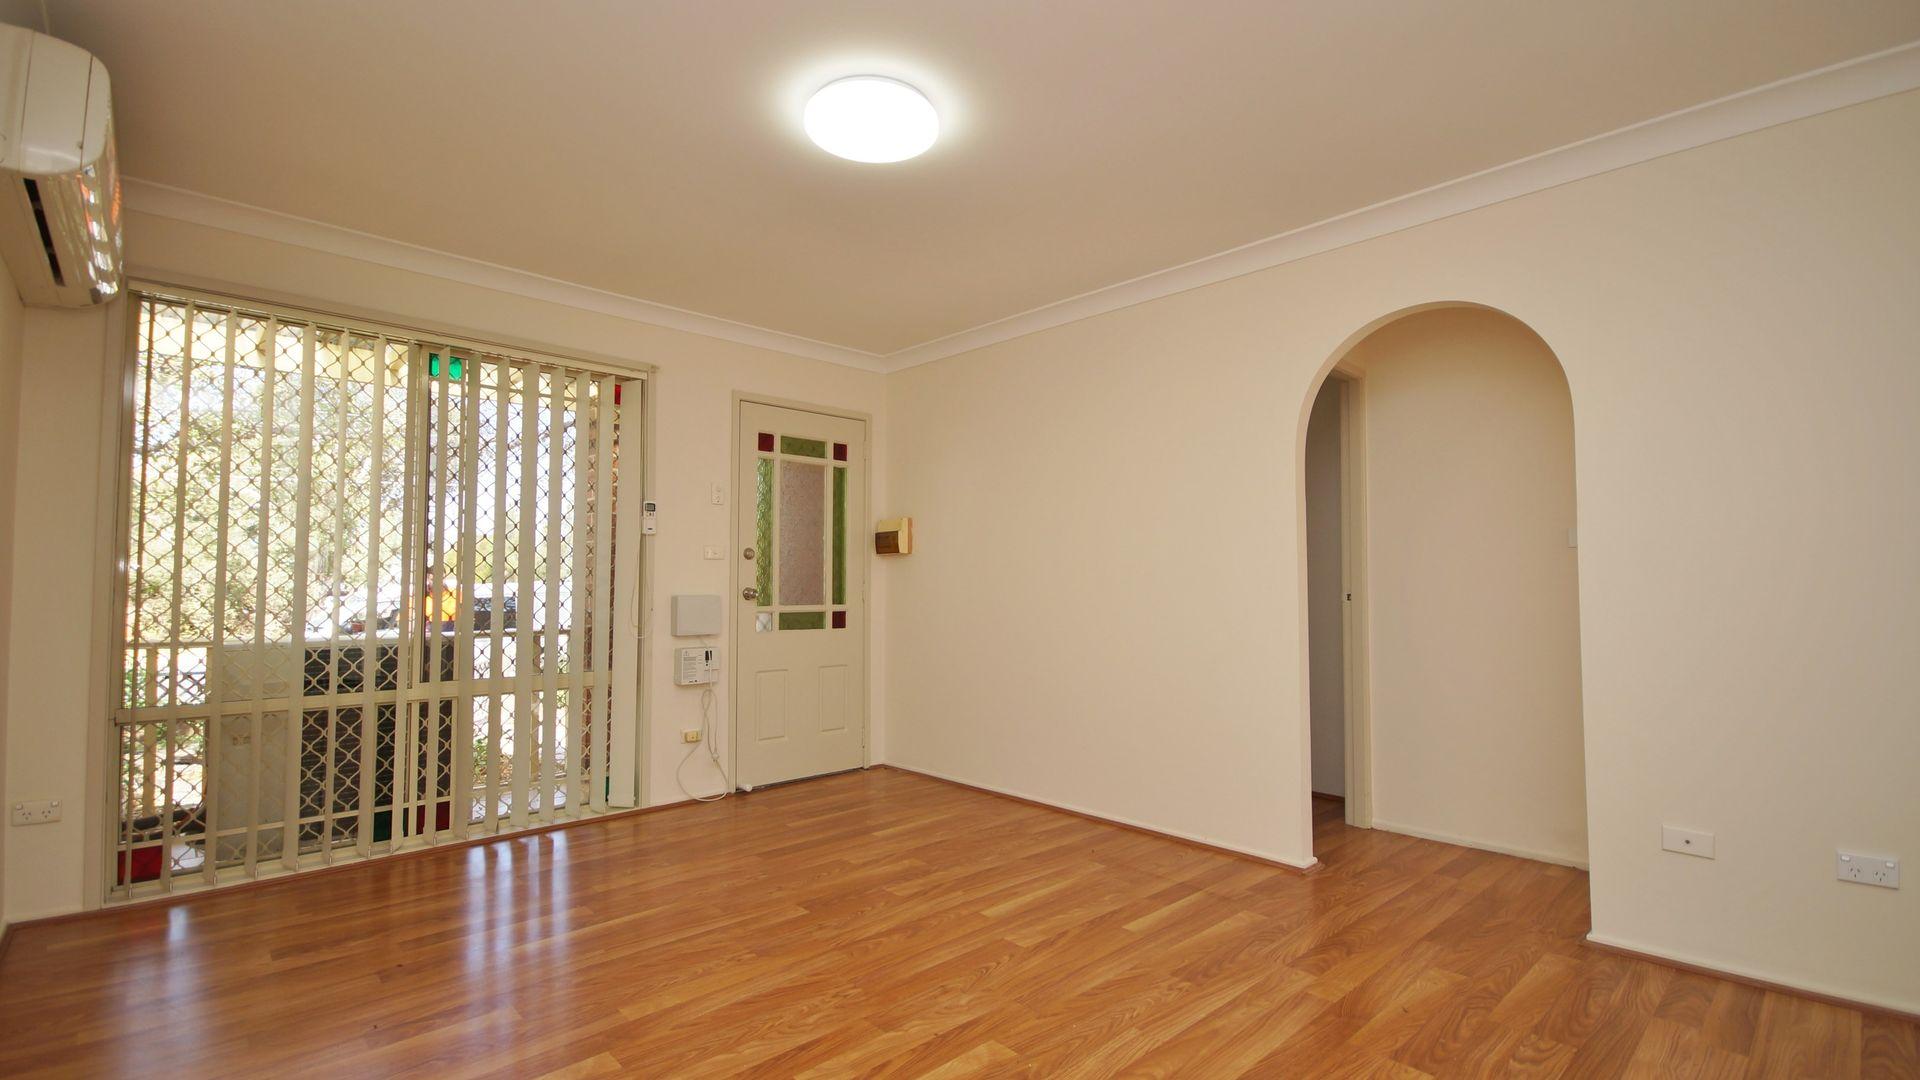 29/129-135 Frances Street, Lidcombe NSW 2141, Image 2